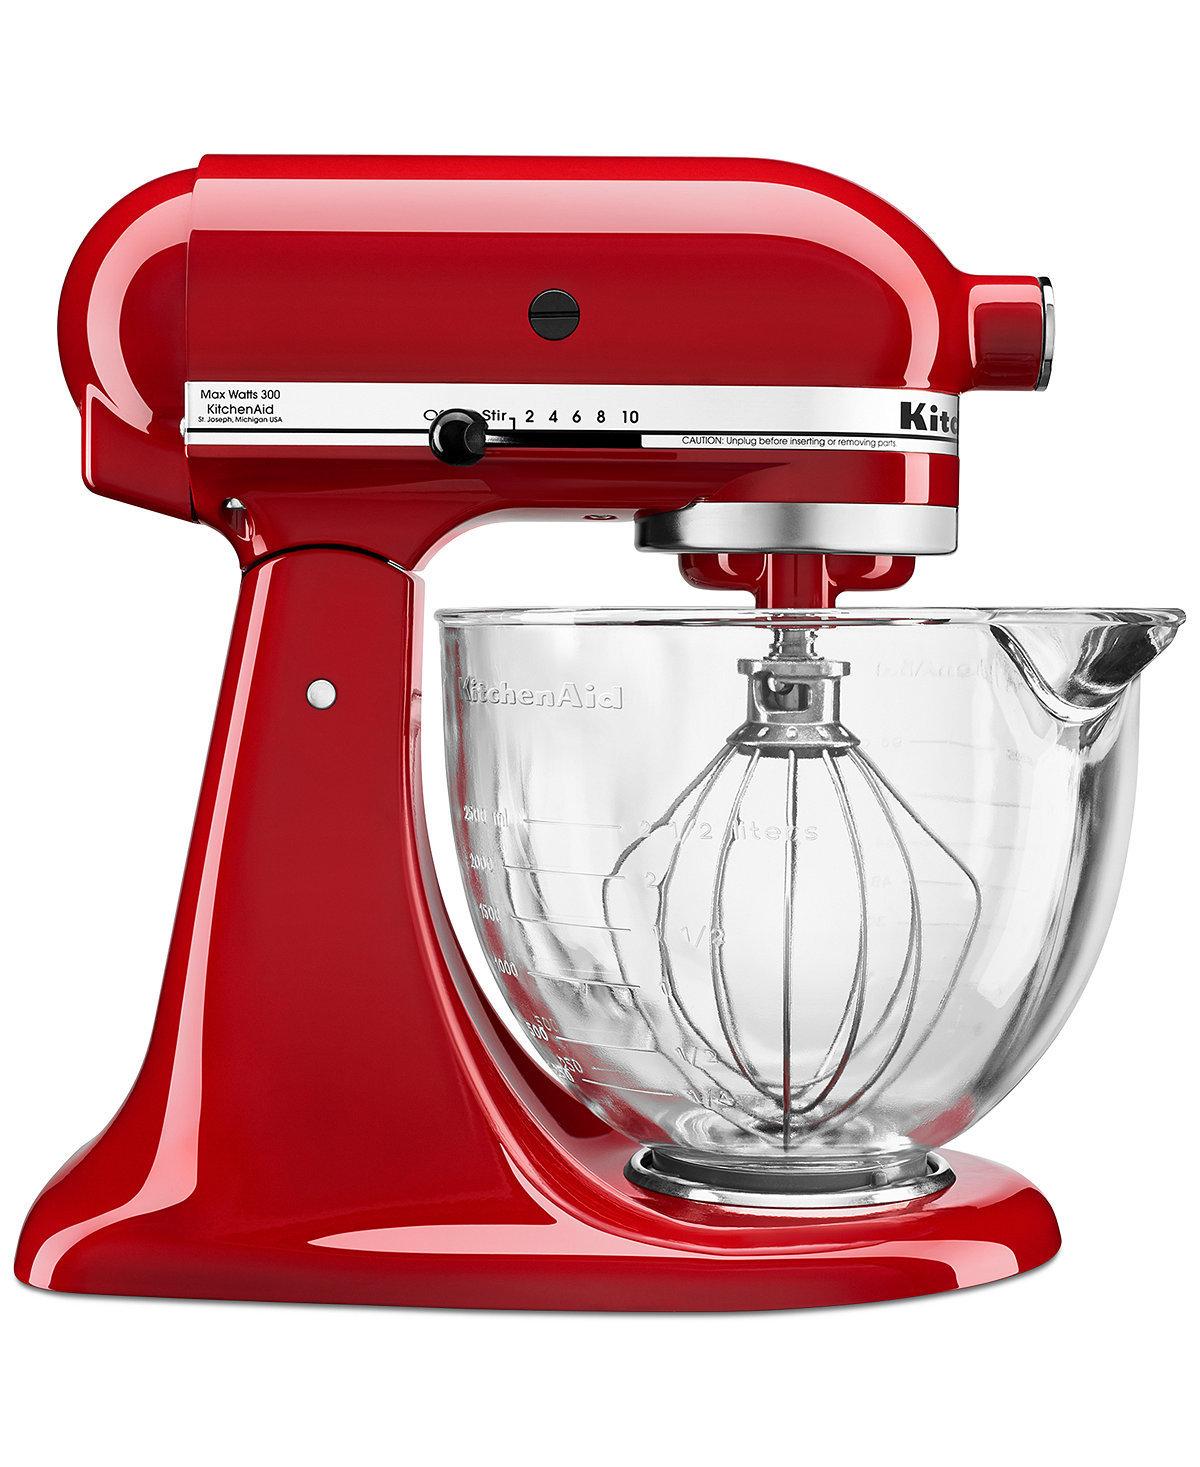 3 Macyu0027s: KitchenAid 5 Qt. Stand Mixer With Glass Bowl U0026 Flex Edge Beater